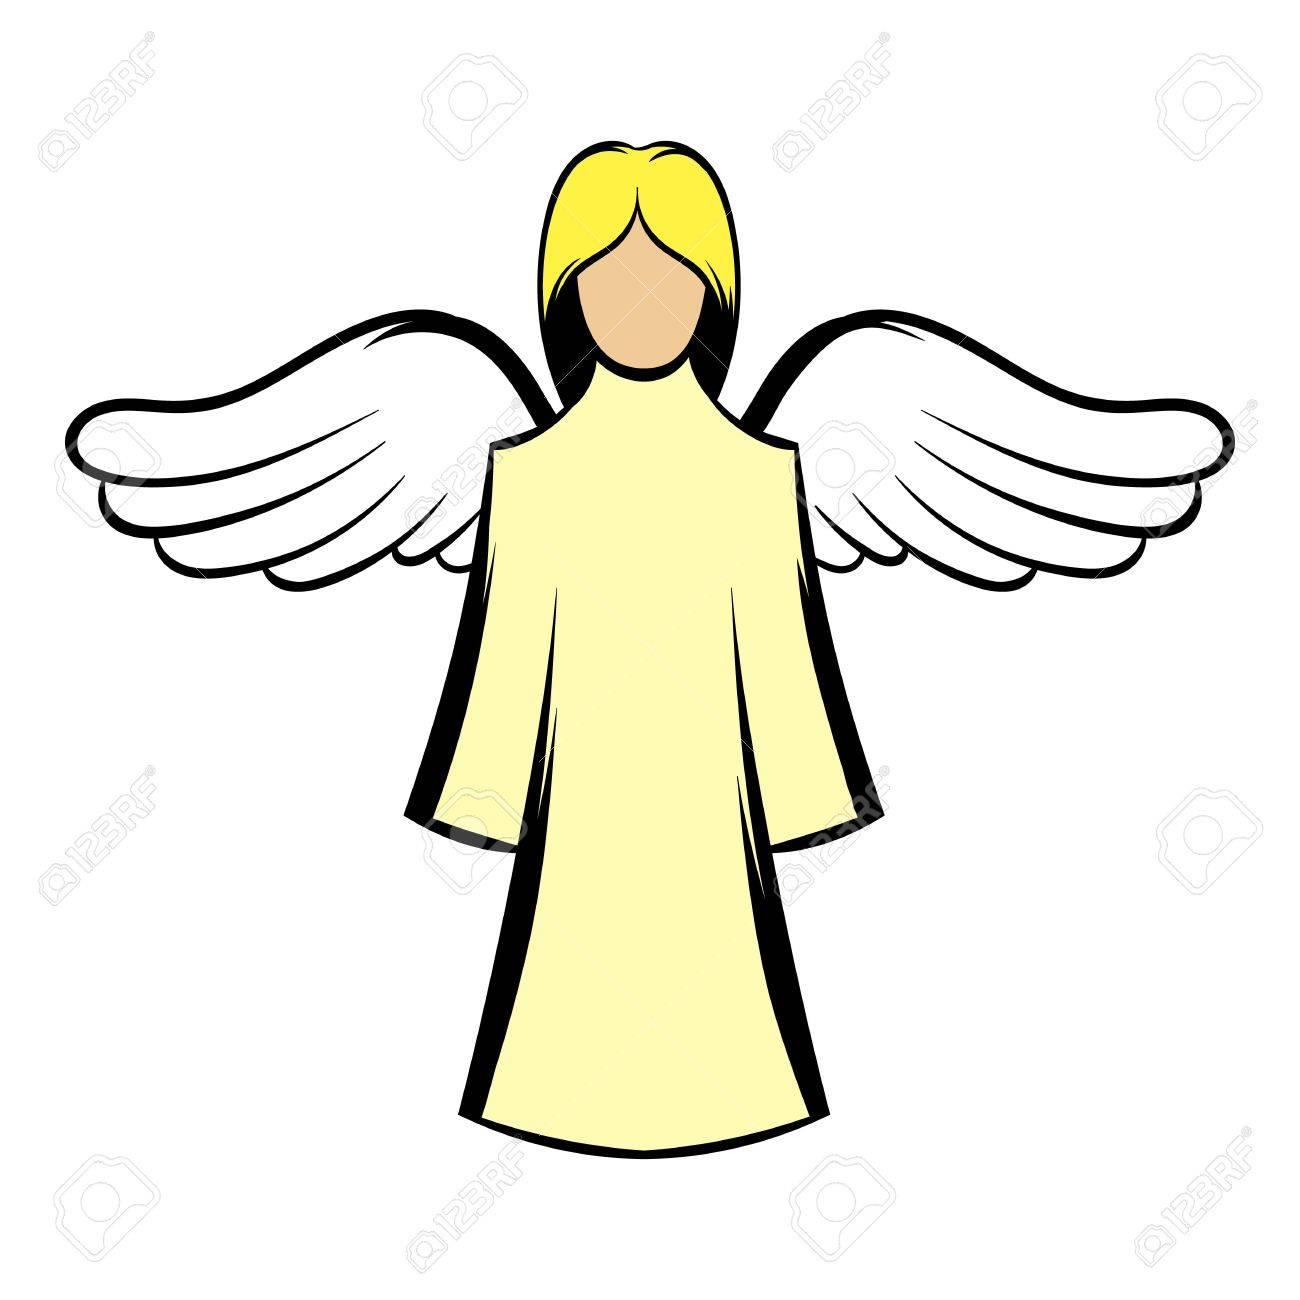 saint angel icon cartoon royalty free cliparts vectors and stock rh 123rf com cartoon baby angel images cartoon baby angel images